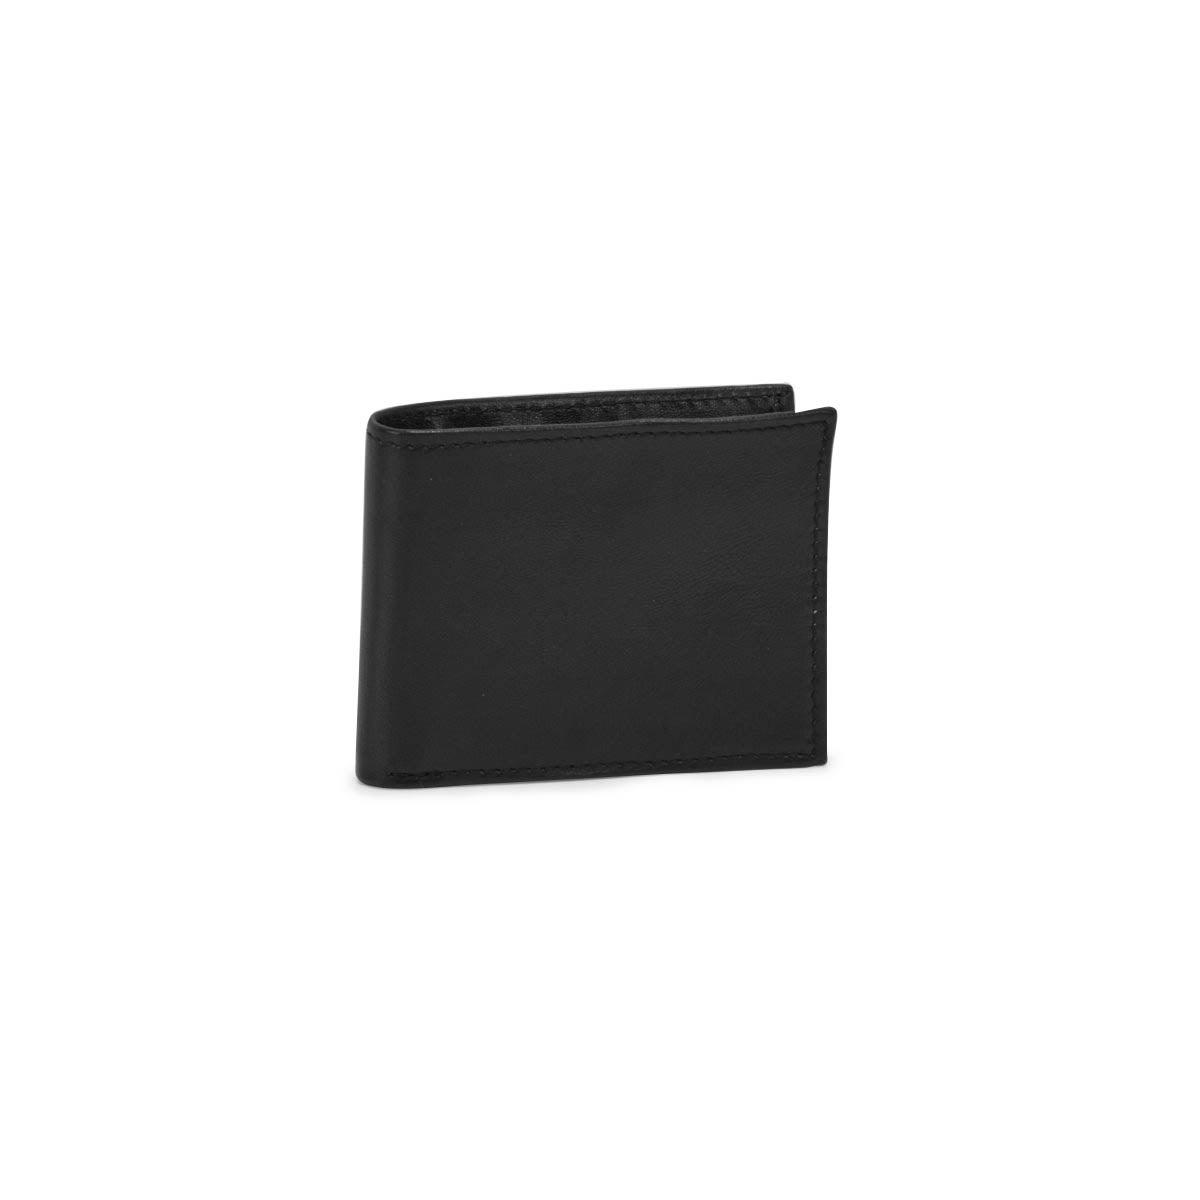 Mns black wallet w/ key fob